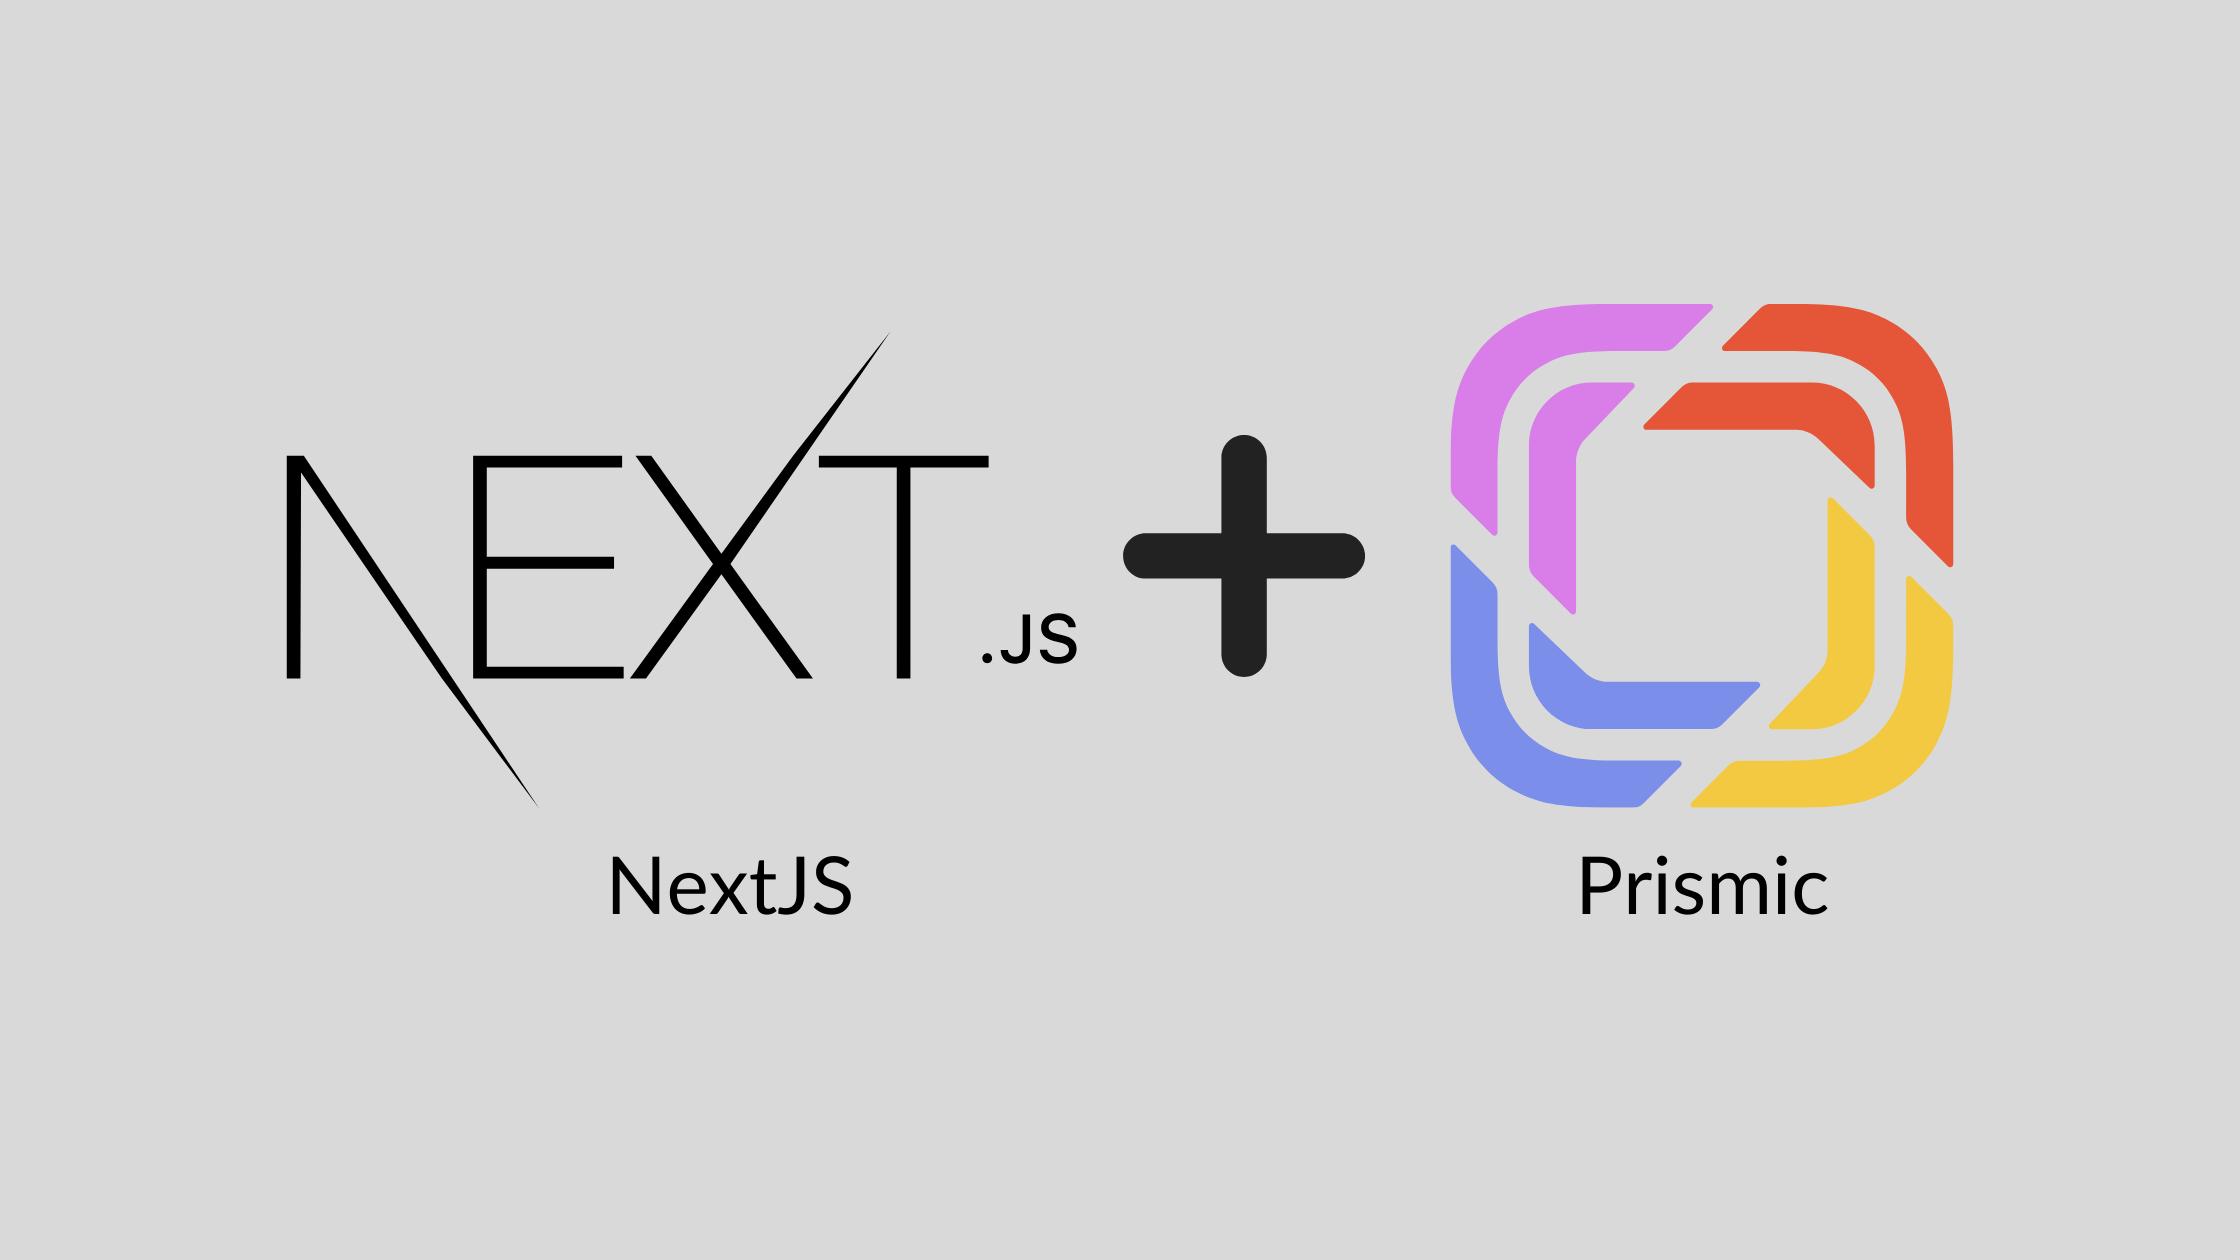 NextJS